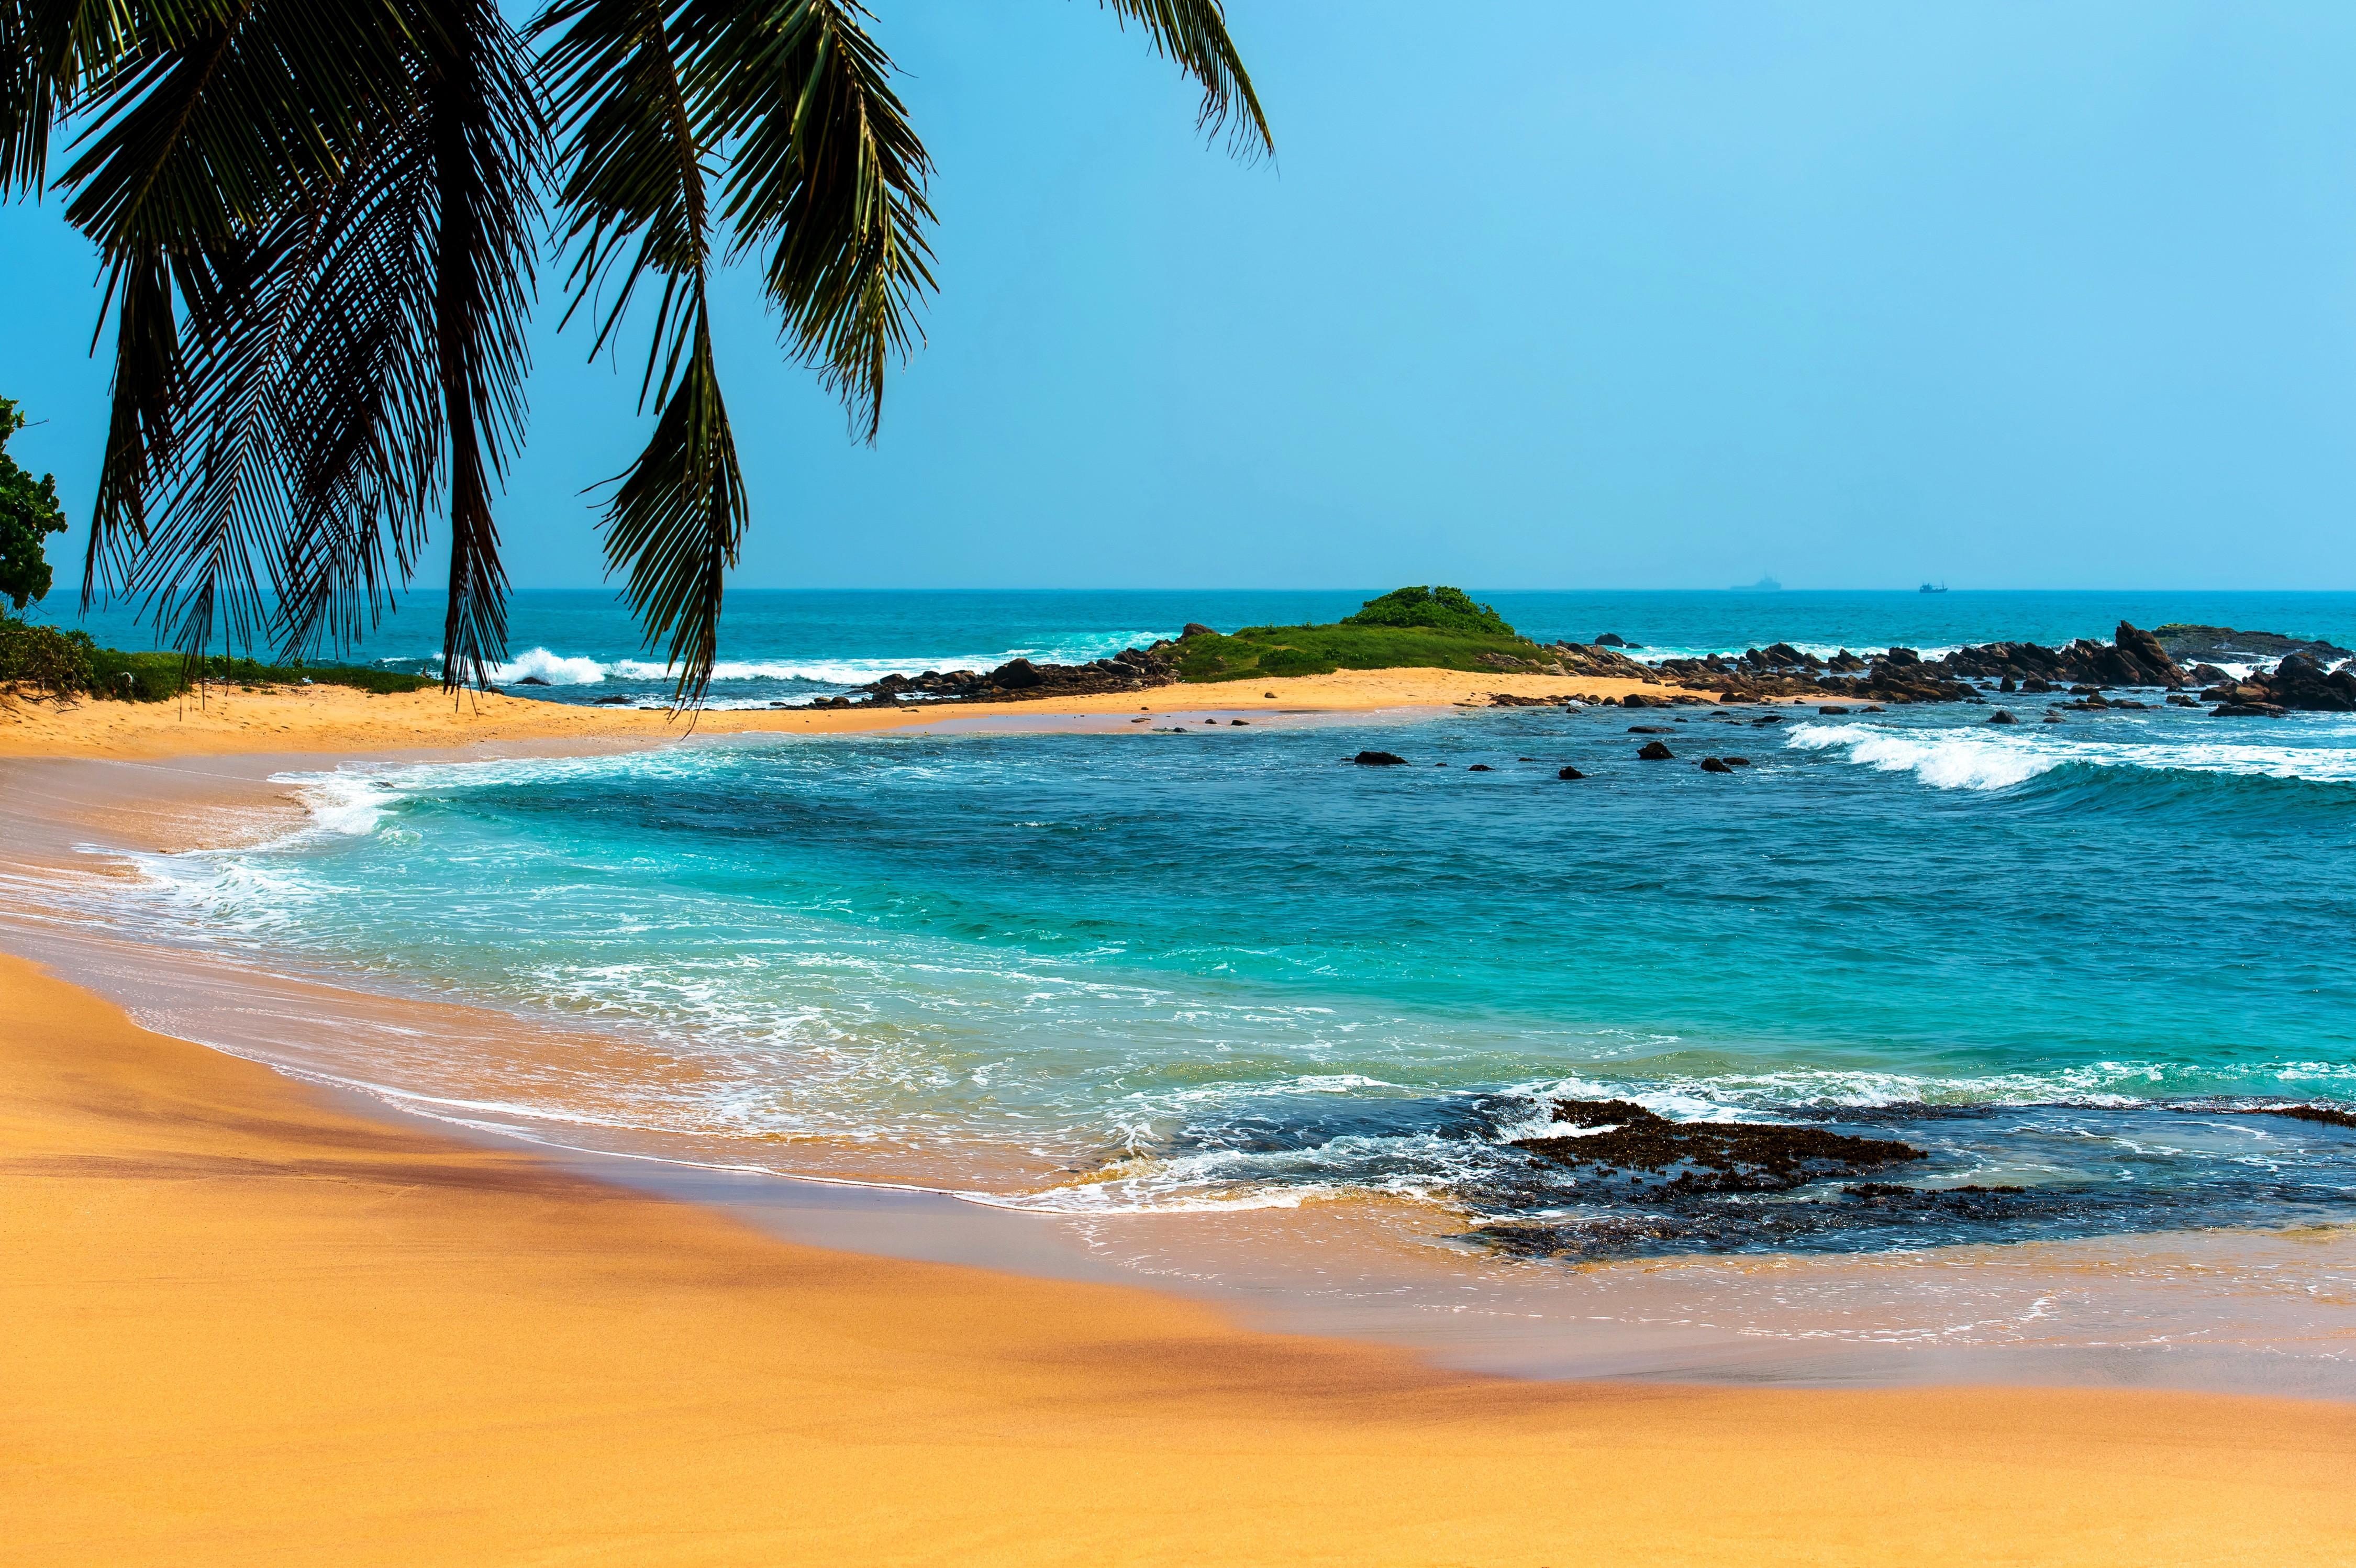 Beach 4k Ultra HD Wallpaper | Background Image | 4500x2995 ...